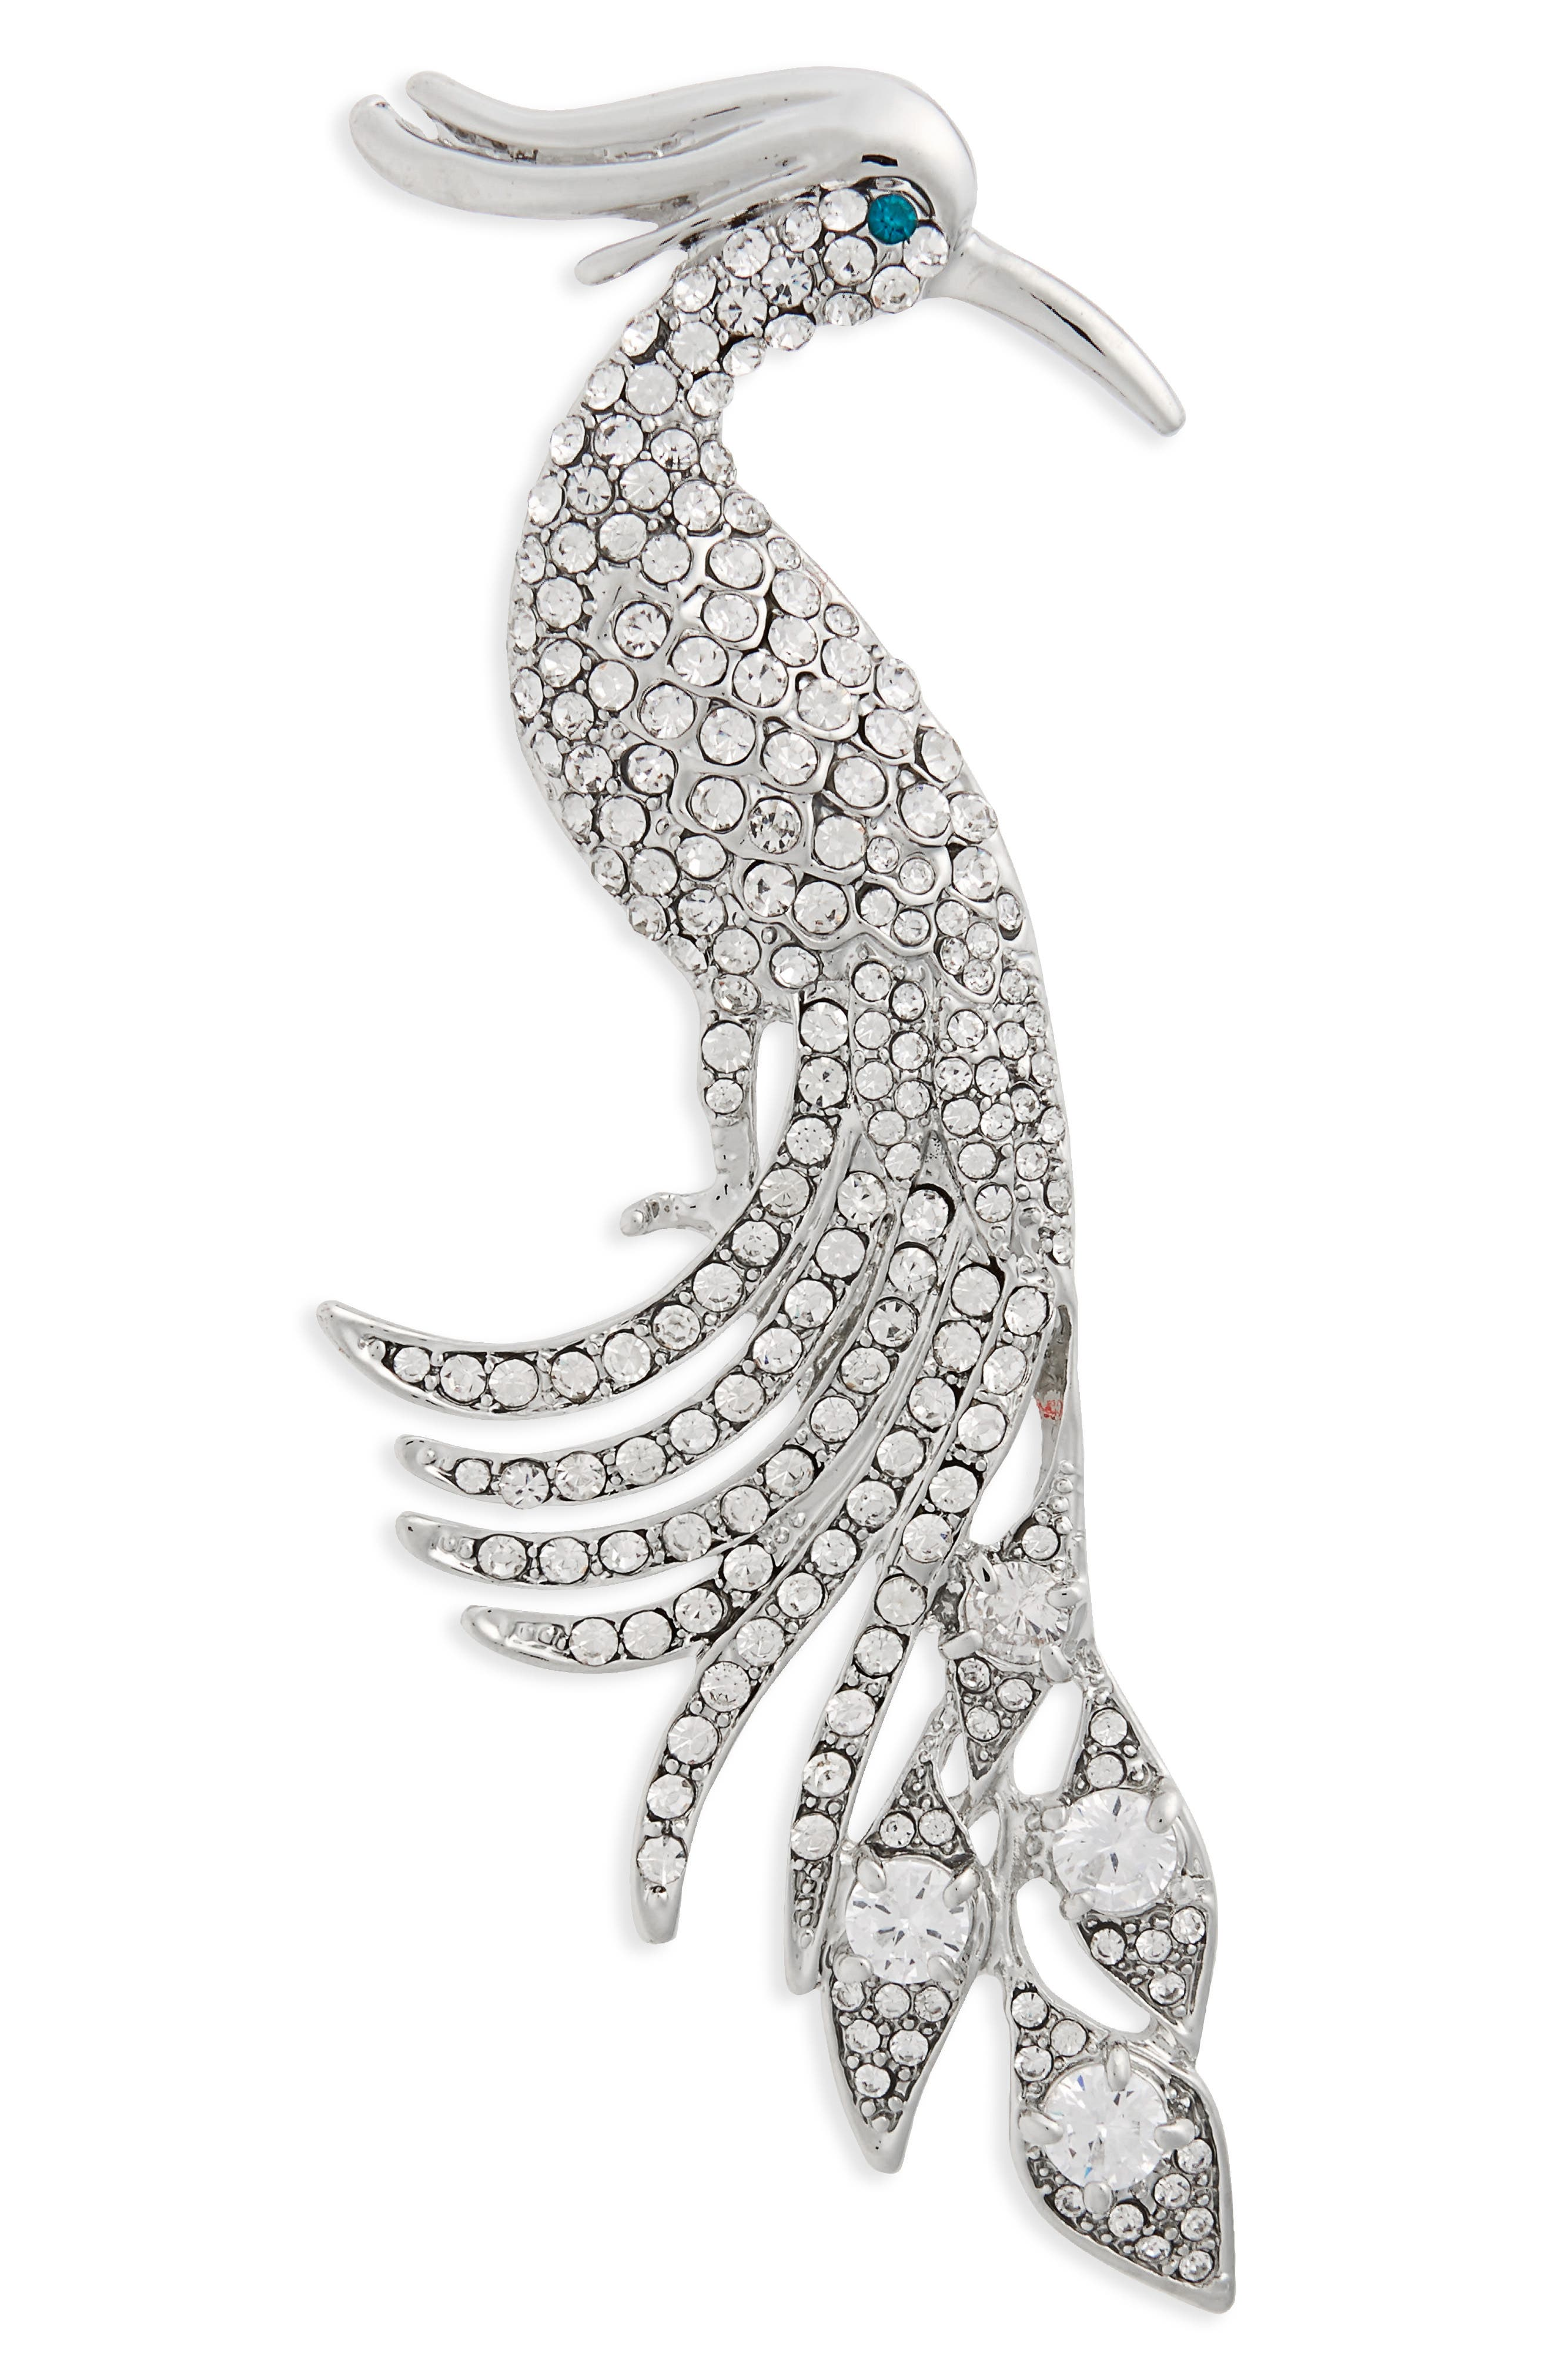 Main Image - Nina Peacock Crystal Brooch